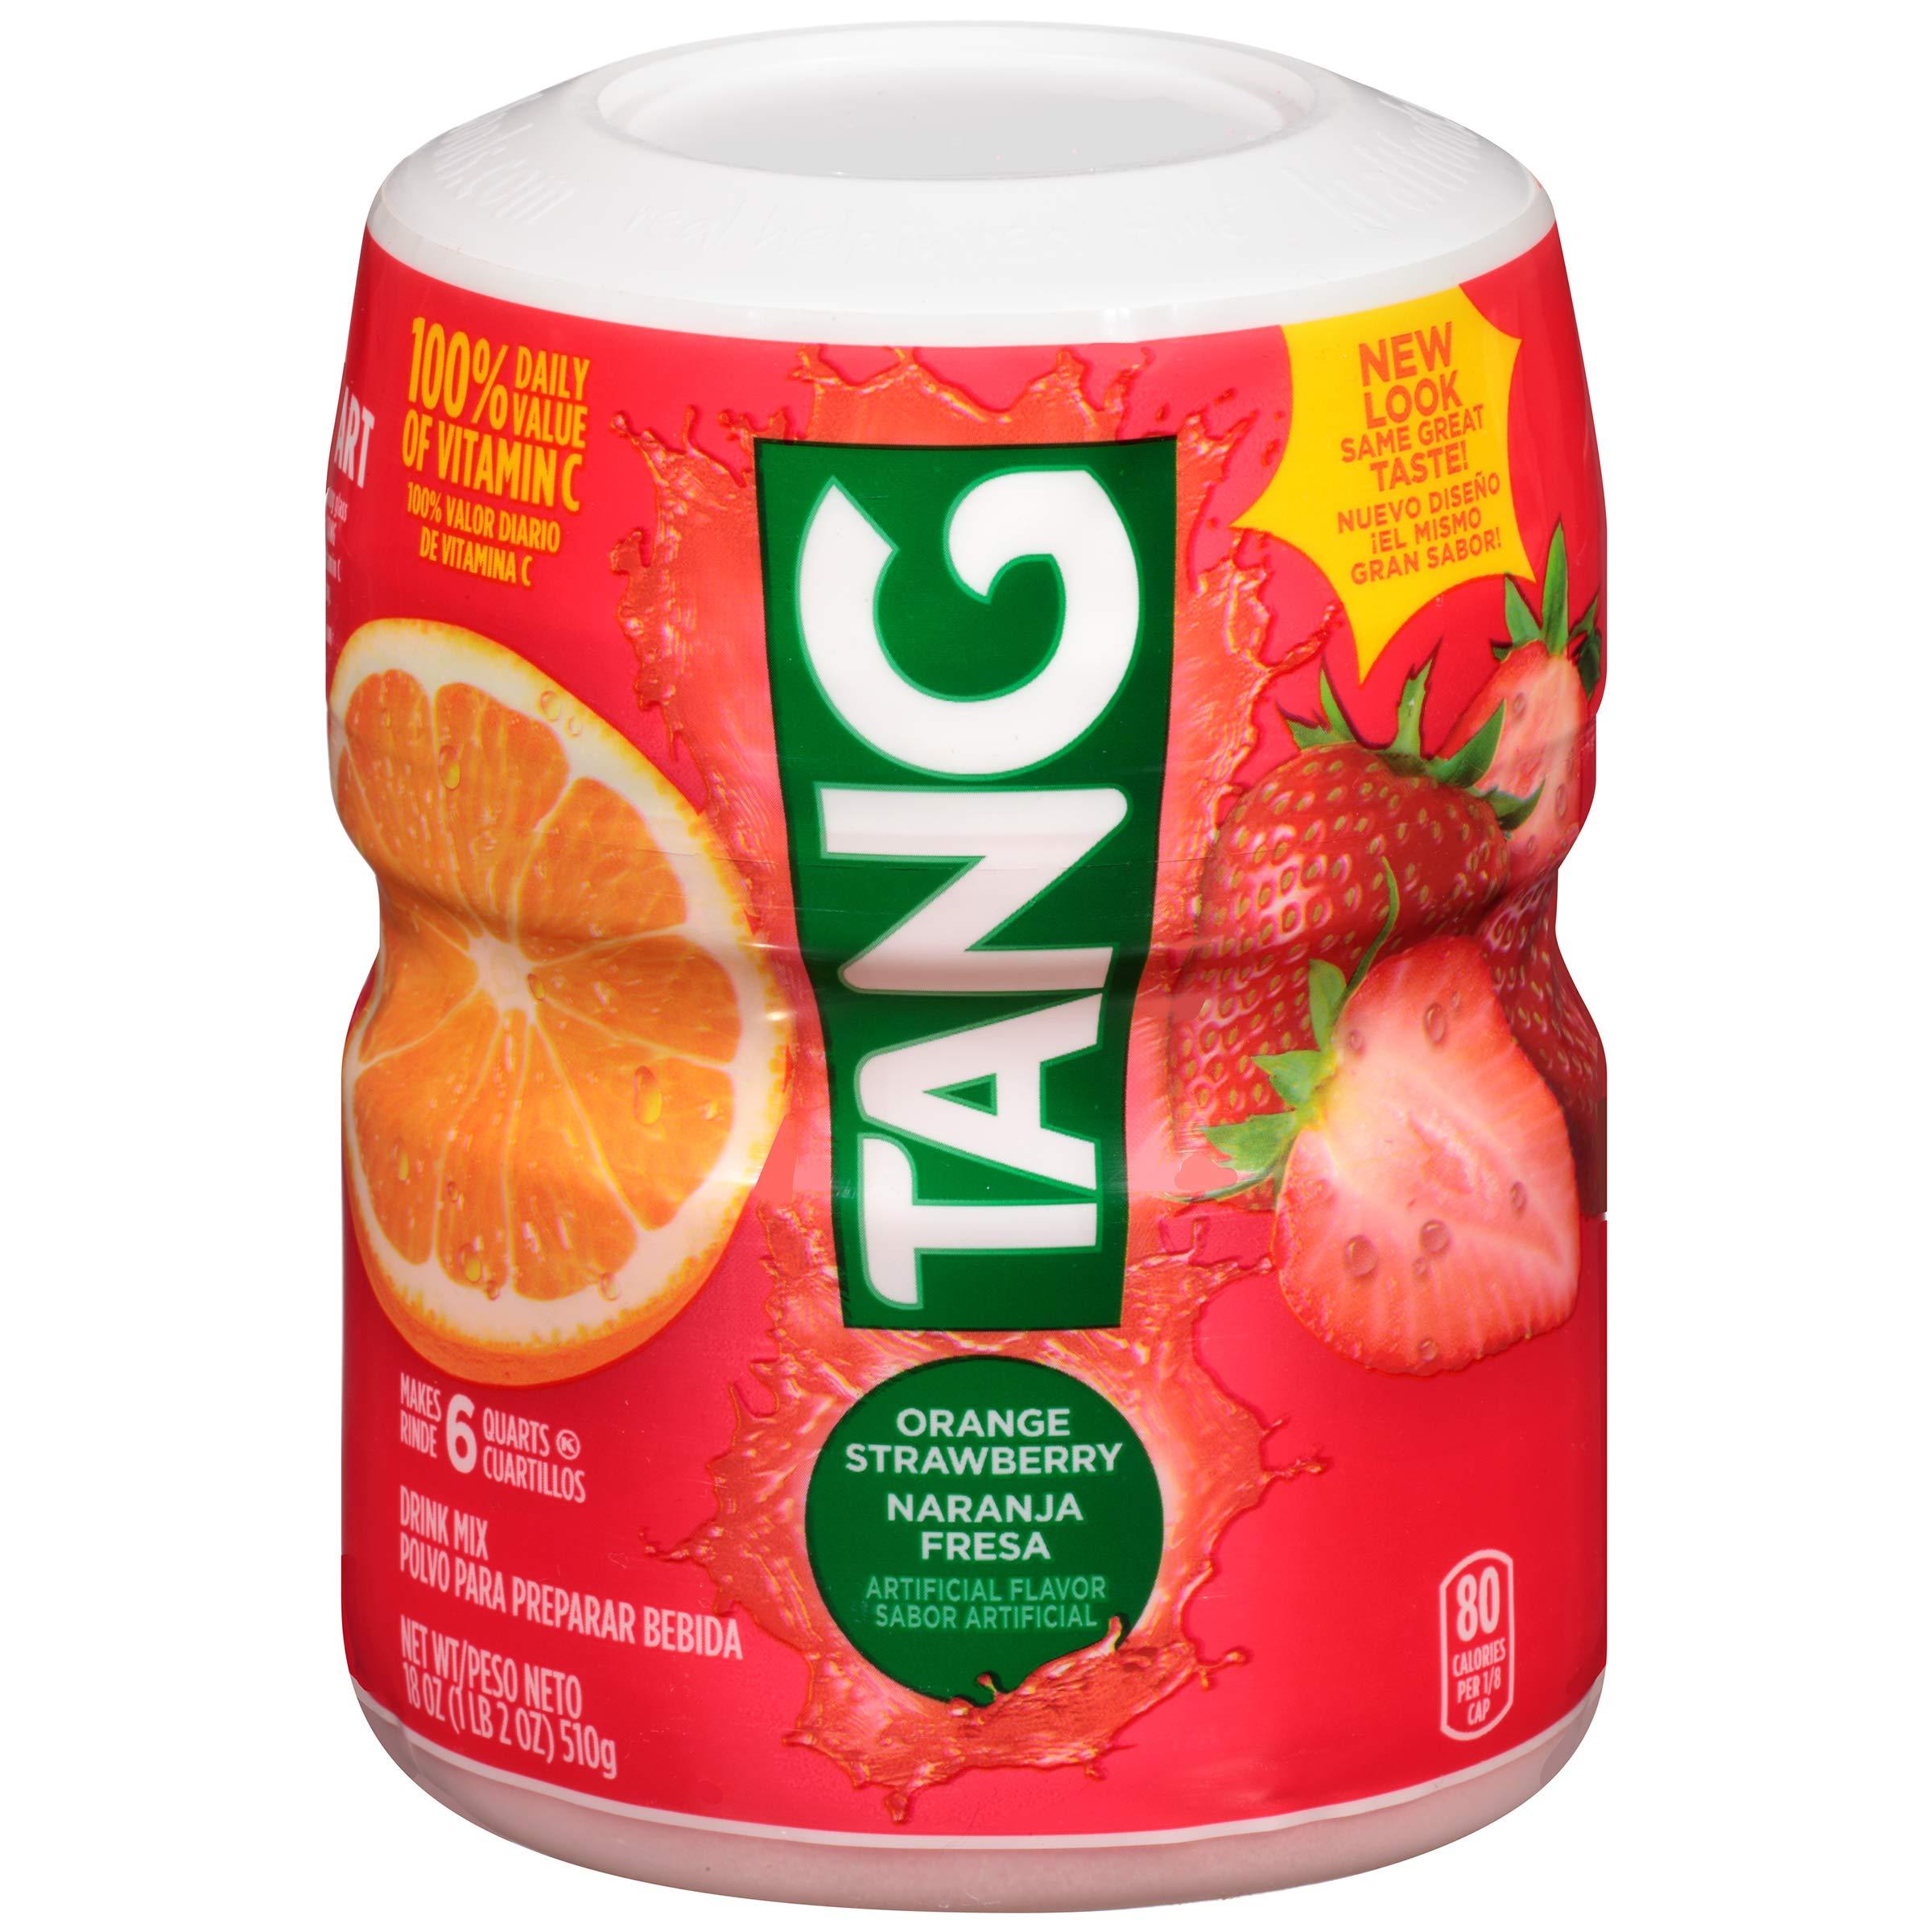 Tang Orange Strawberry Powdered Drink Mix (18 oz Jars, Pack of 12)